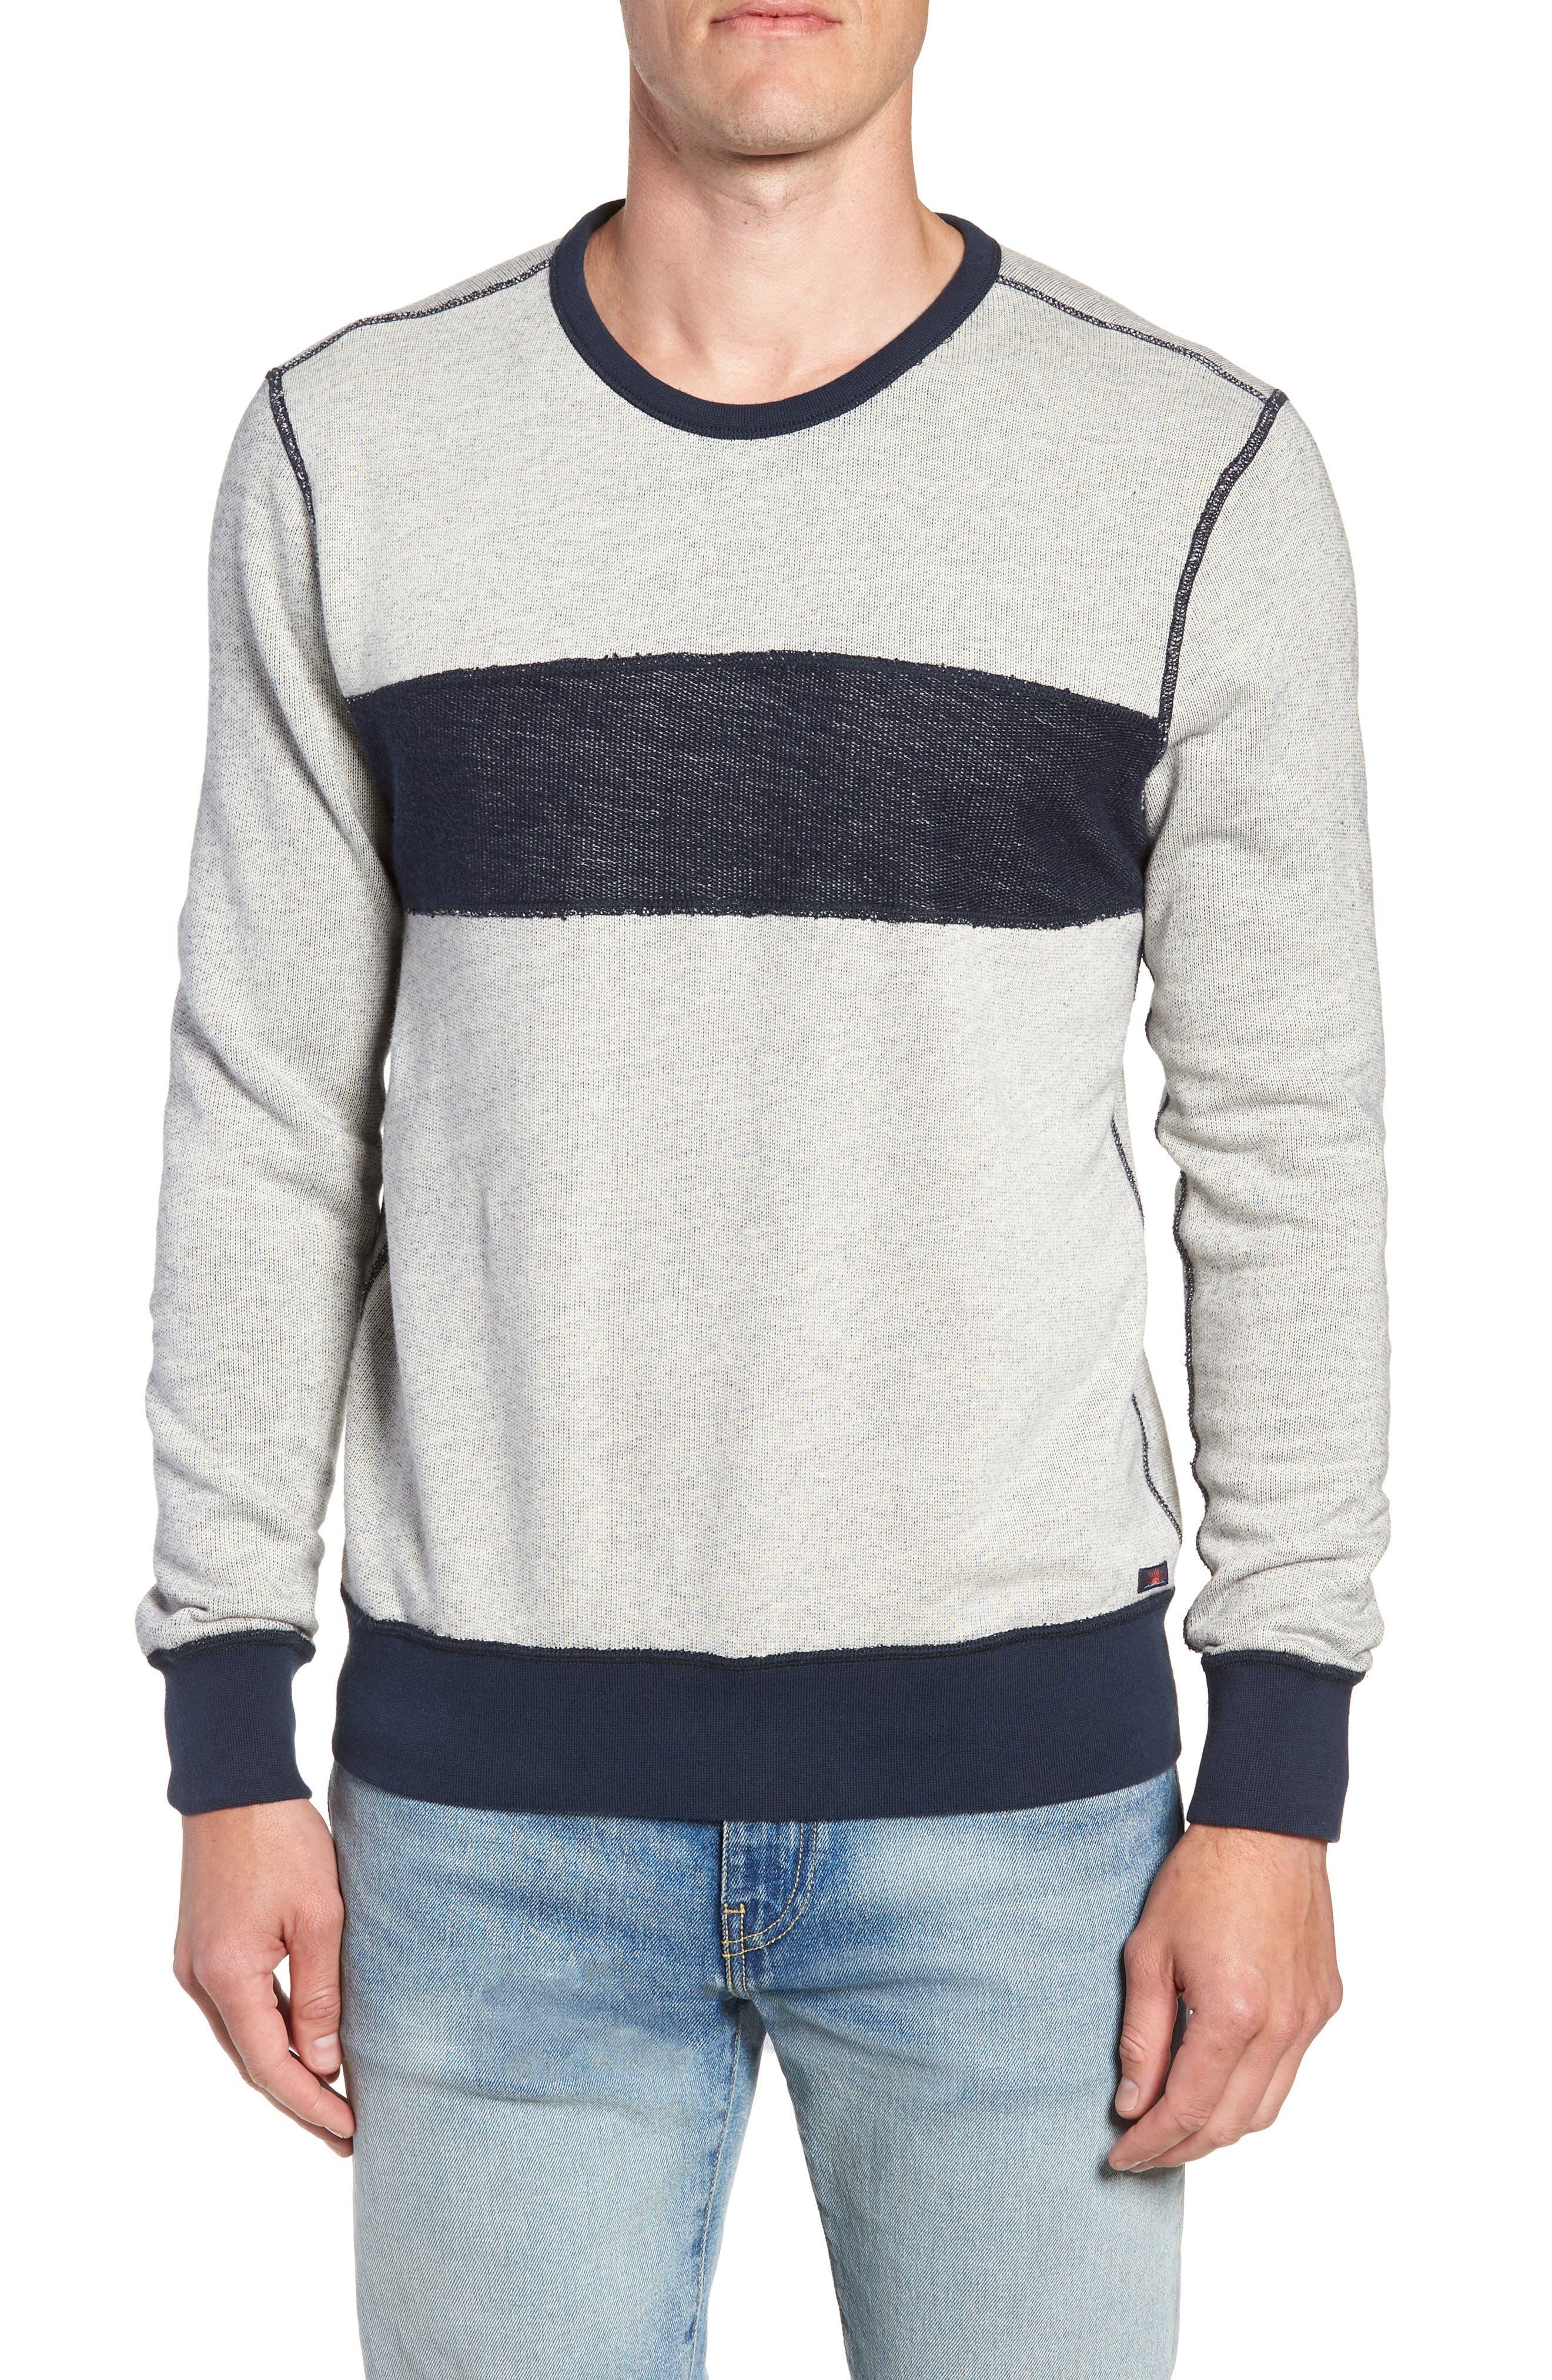 Reversible Colorblock Terry Sweatshirt,                             Alternate thumbnail 6, color,                             Navy / Grey